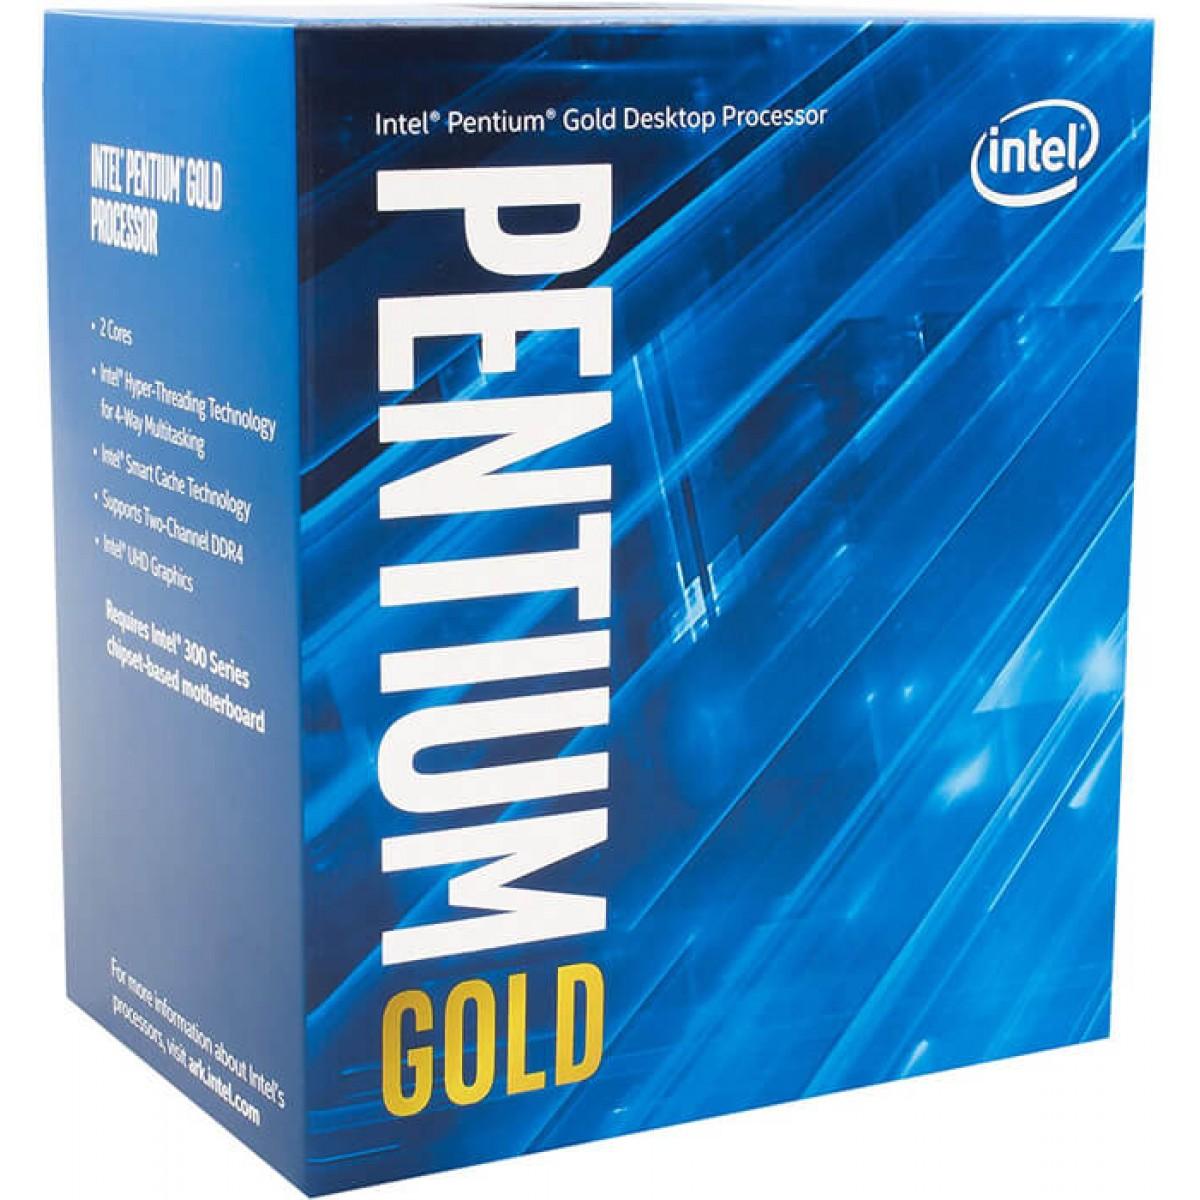 PROCESSADOR 1200 PENTIUM GOLD G6400 COMET LAKE 4.0 GHZ 4MB  BX80701G6400 INTEL